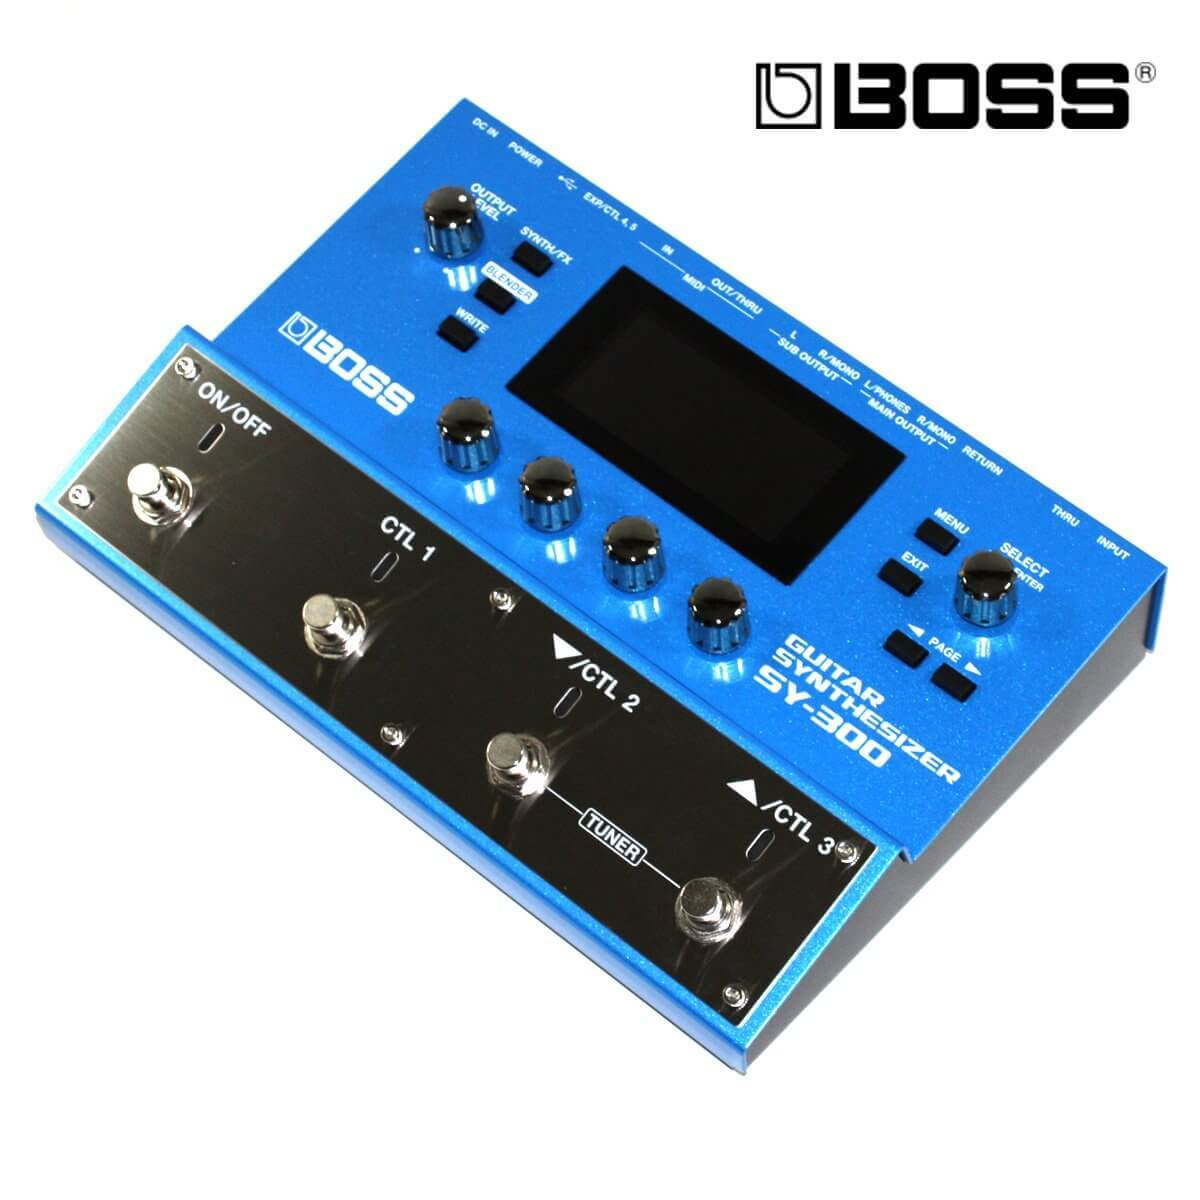 BOSS SY 300 电吉他合成效果器